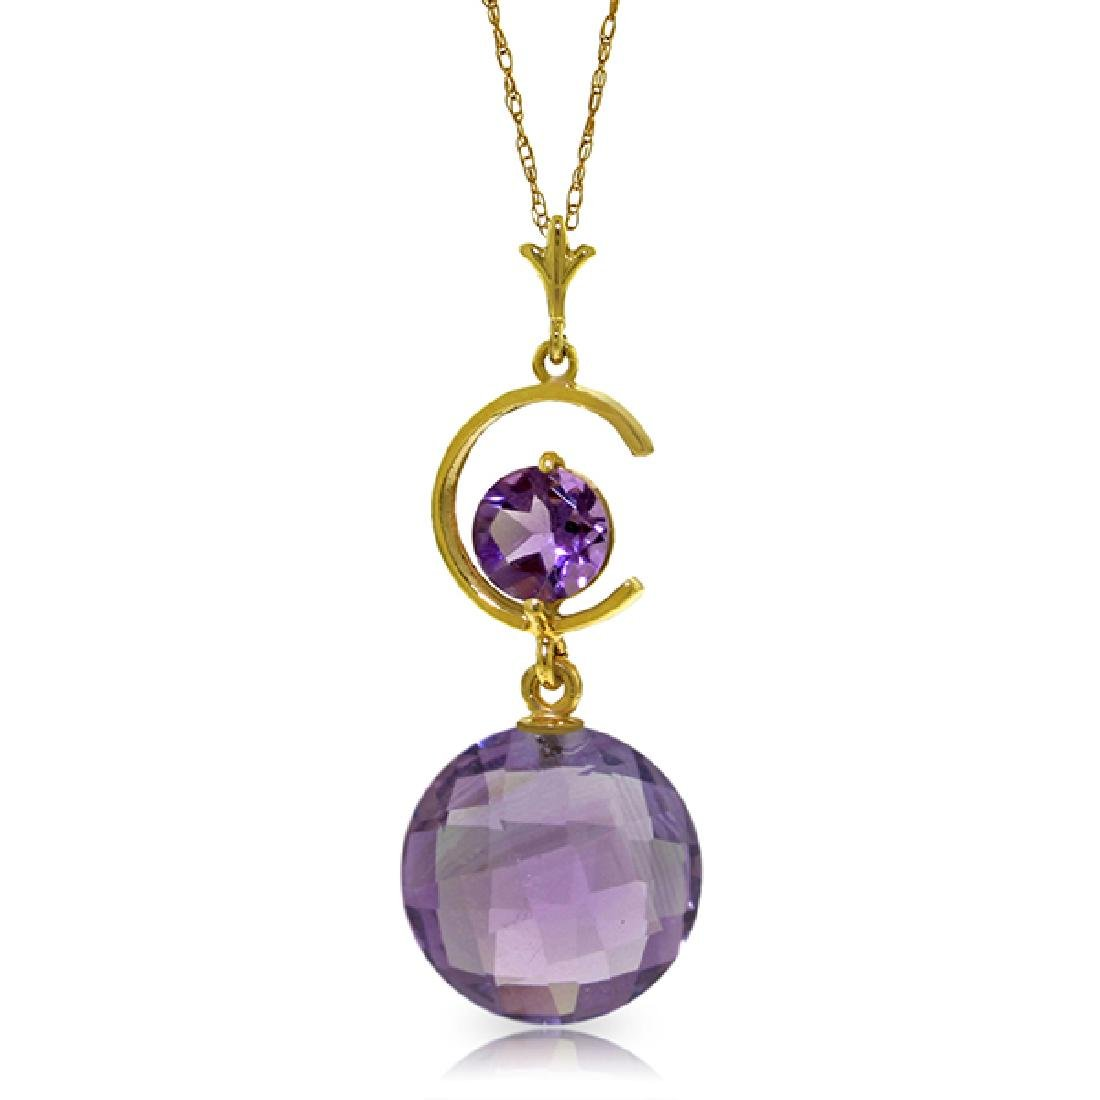 Genuine 5.8 ctw Amethyst Necklace Jewelry 14KT Yellow